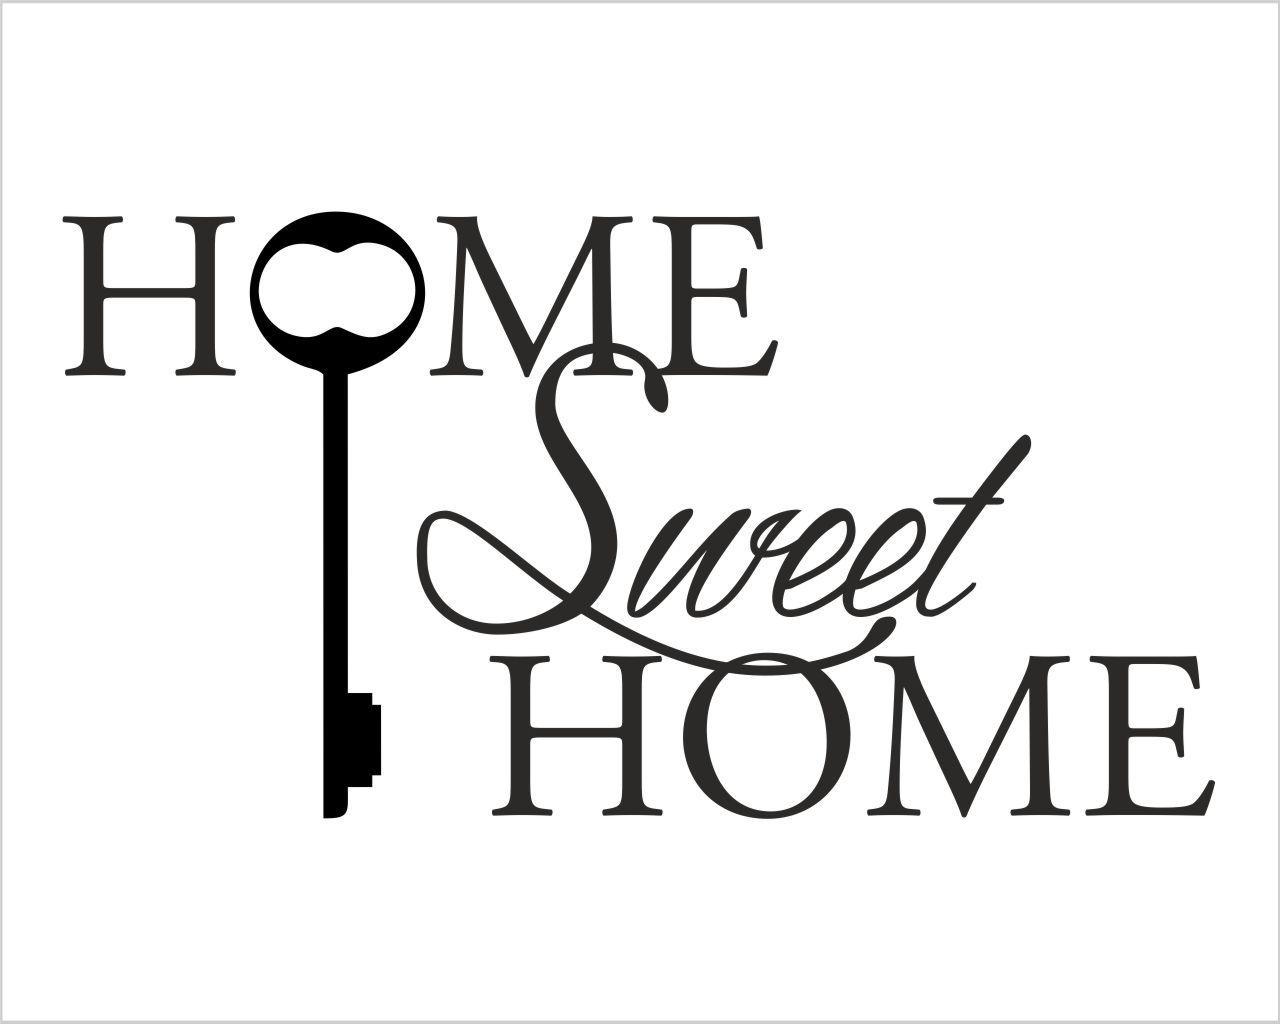 Adesivi Murali Home Sweet Home.Adesivo Murale Casa Home Sweet Home Appendiabiti Design Interni Decori Adesivi Murali Wall Stickers Sweet Home Design Sweet Home Wall Stickers Home